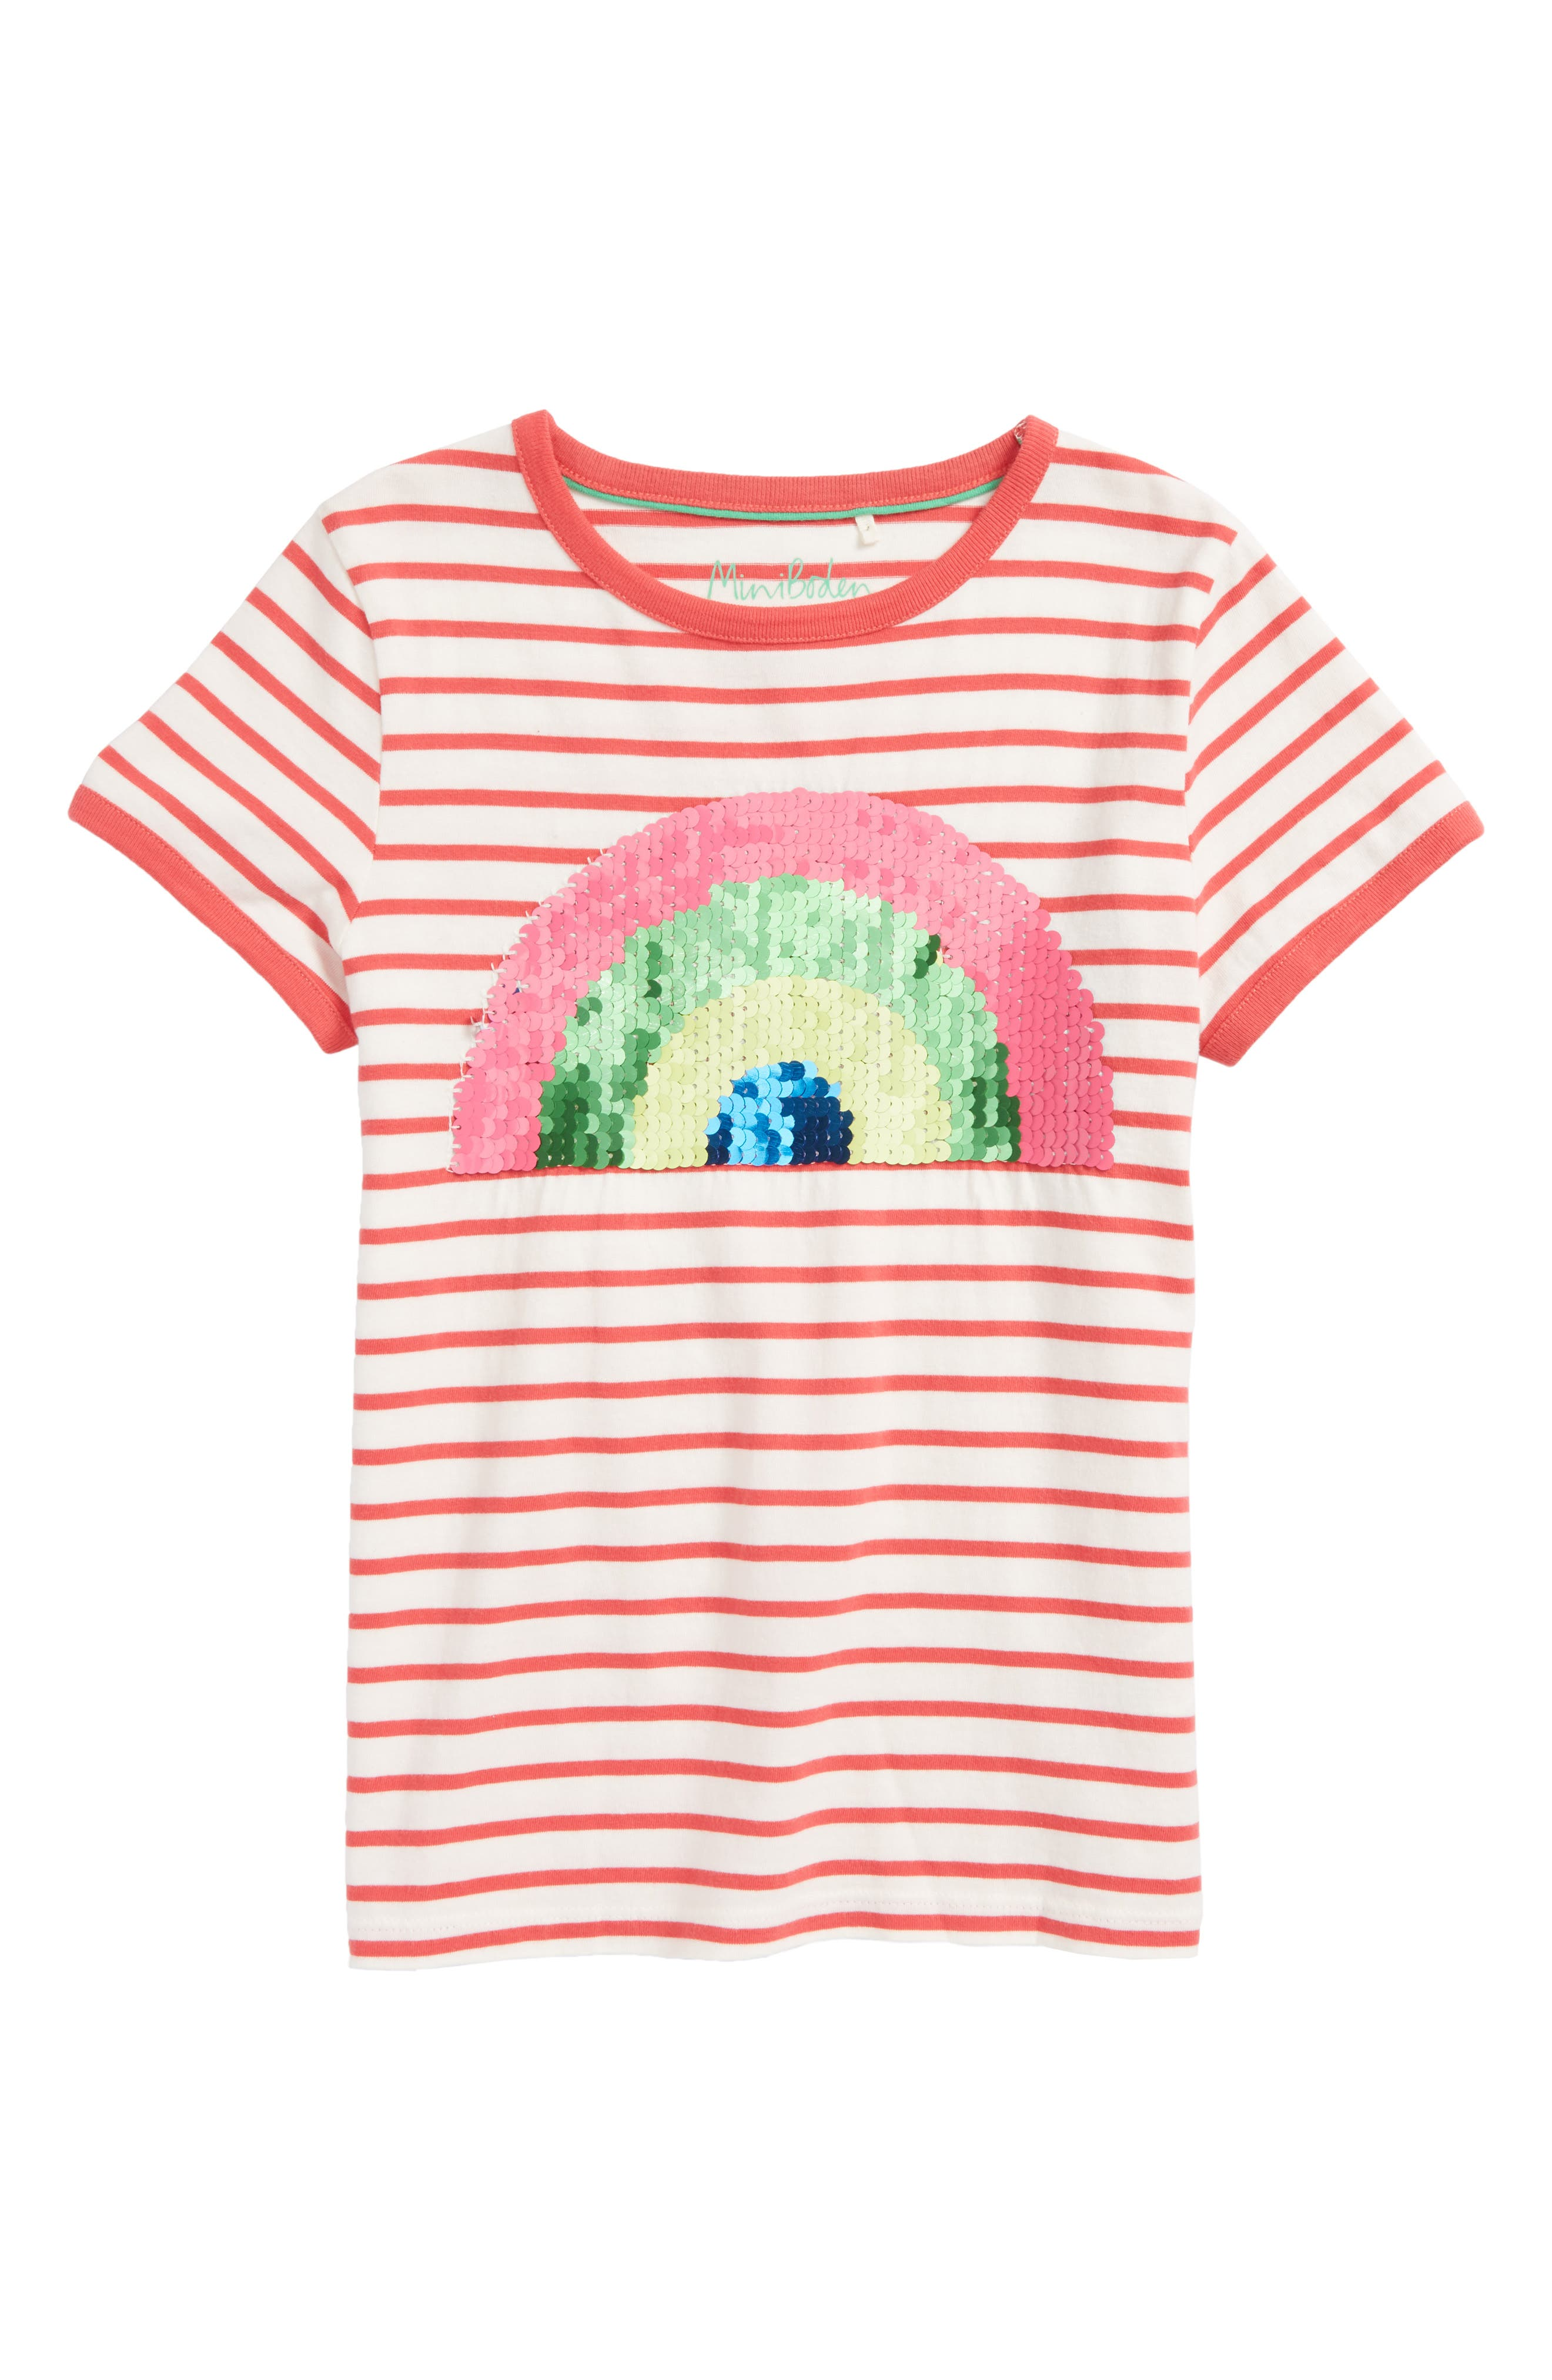 Mini Boden Color Change Sequin Tee (Toddler Girls, Little Girls & Big Girls)